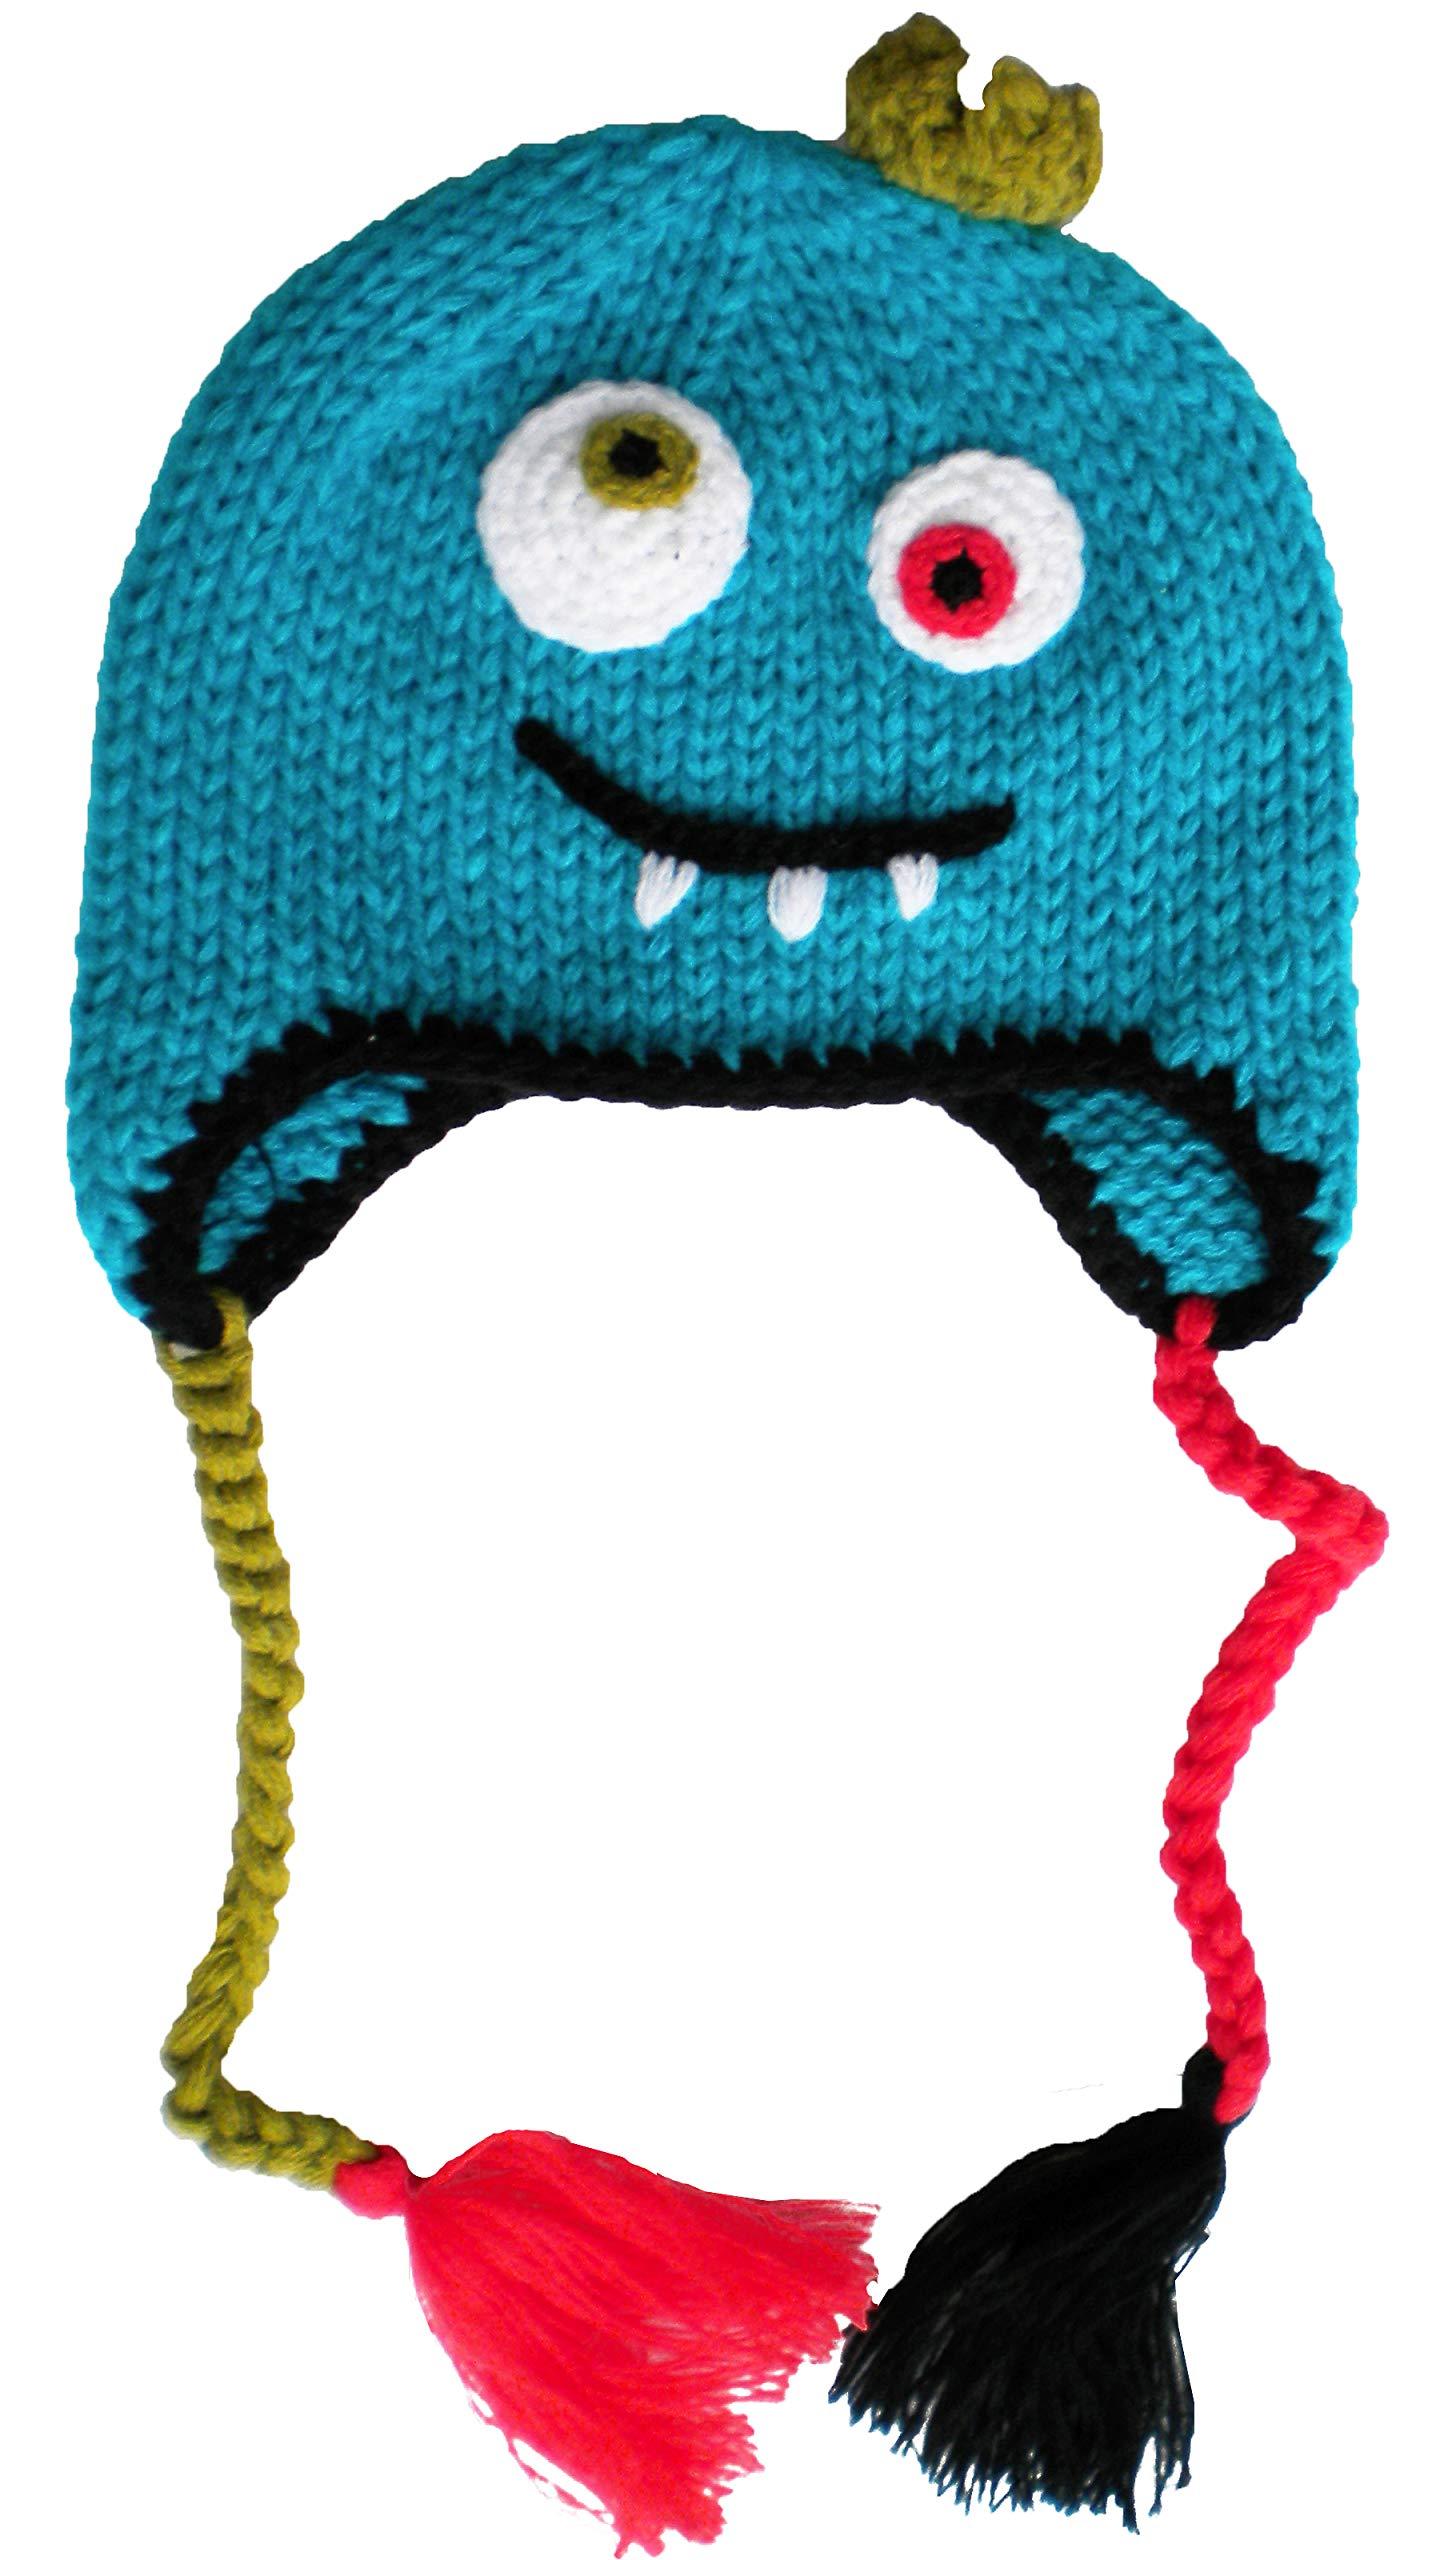 Huggalugs Baby and Toddler Monster Beanie Hat Medium by Huggalugs